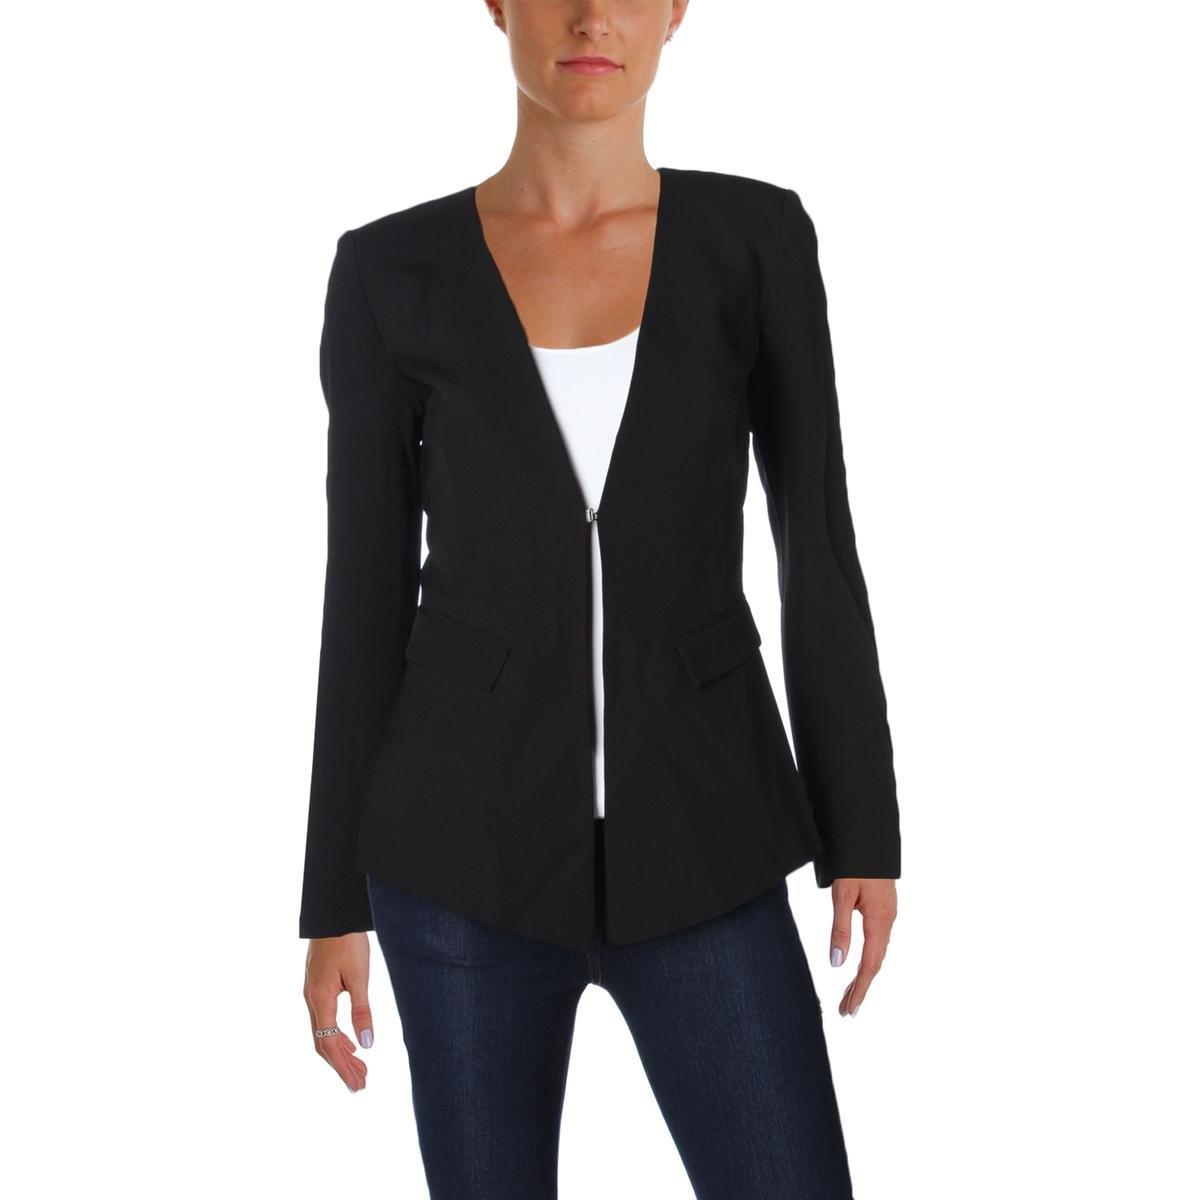 Ramy Brook Womens Crepe Pleated Vent Collarless Blazer Black 4